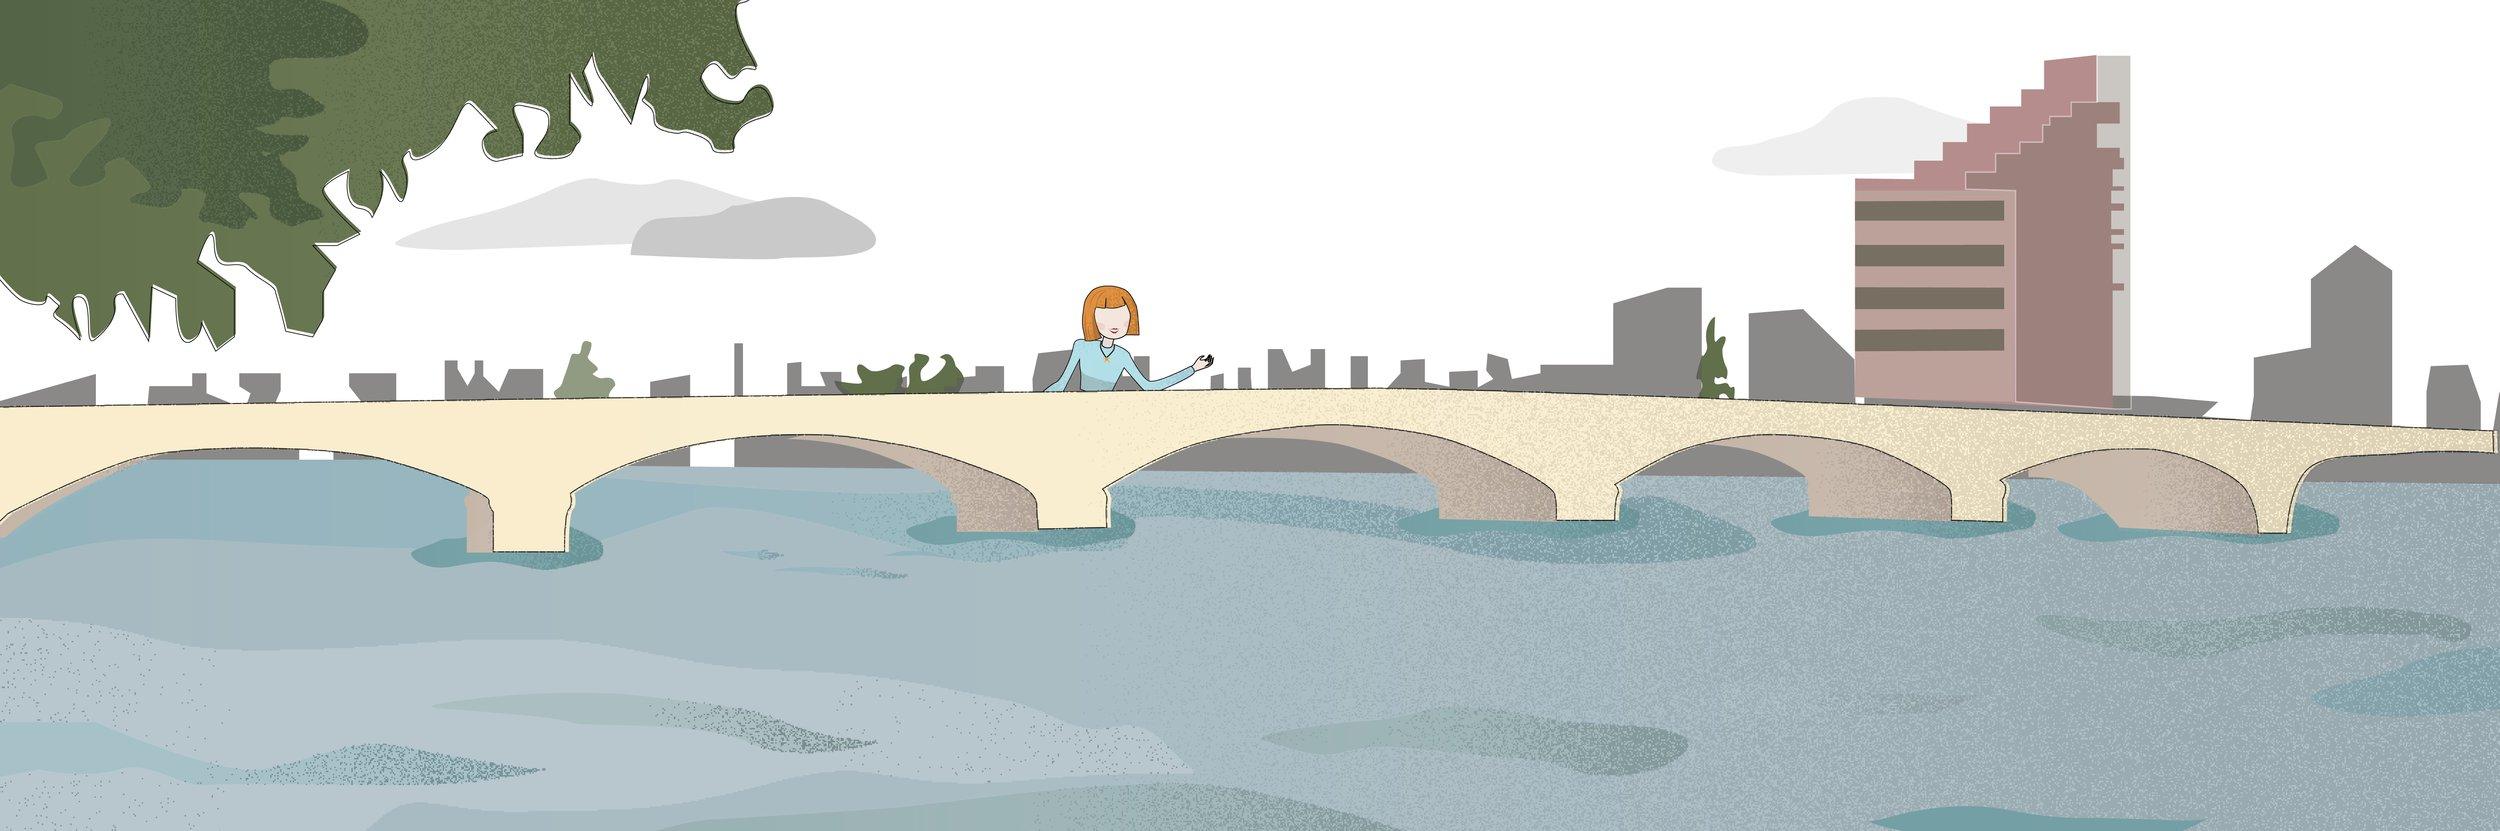 6 Linda illustration-PUTNEY.jpg